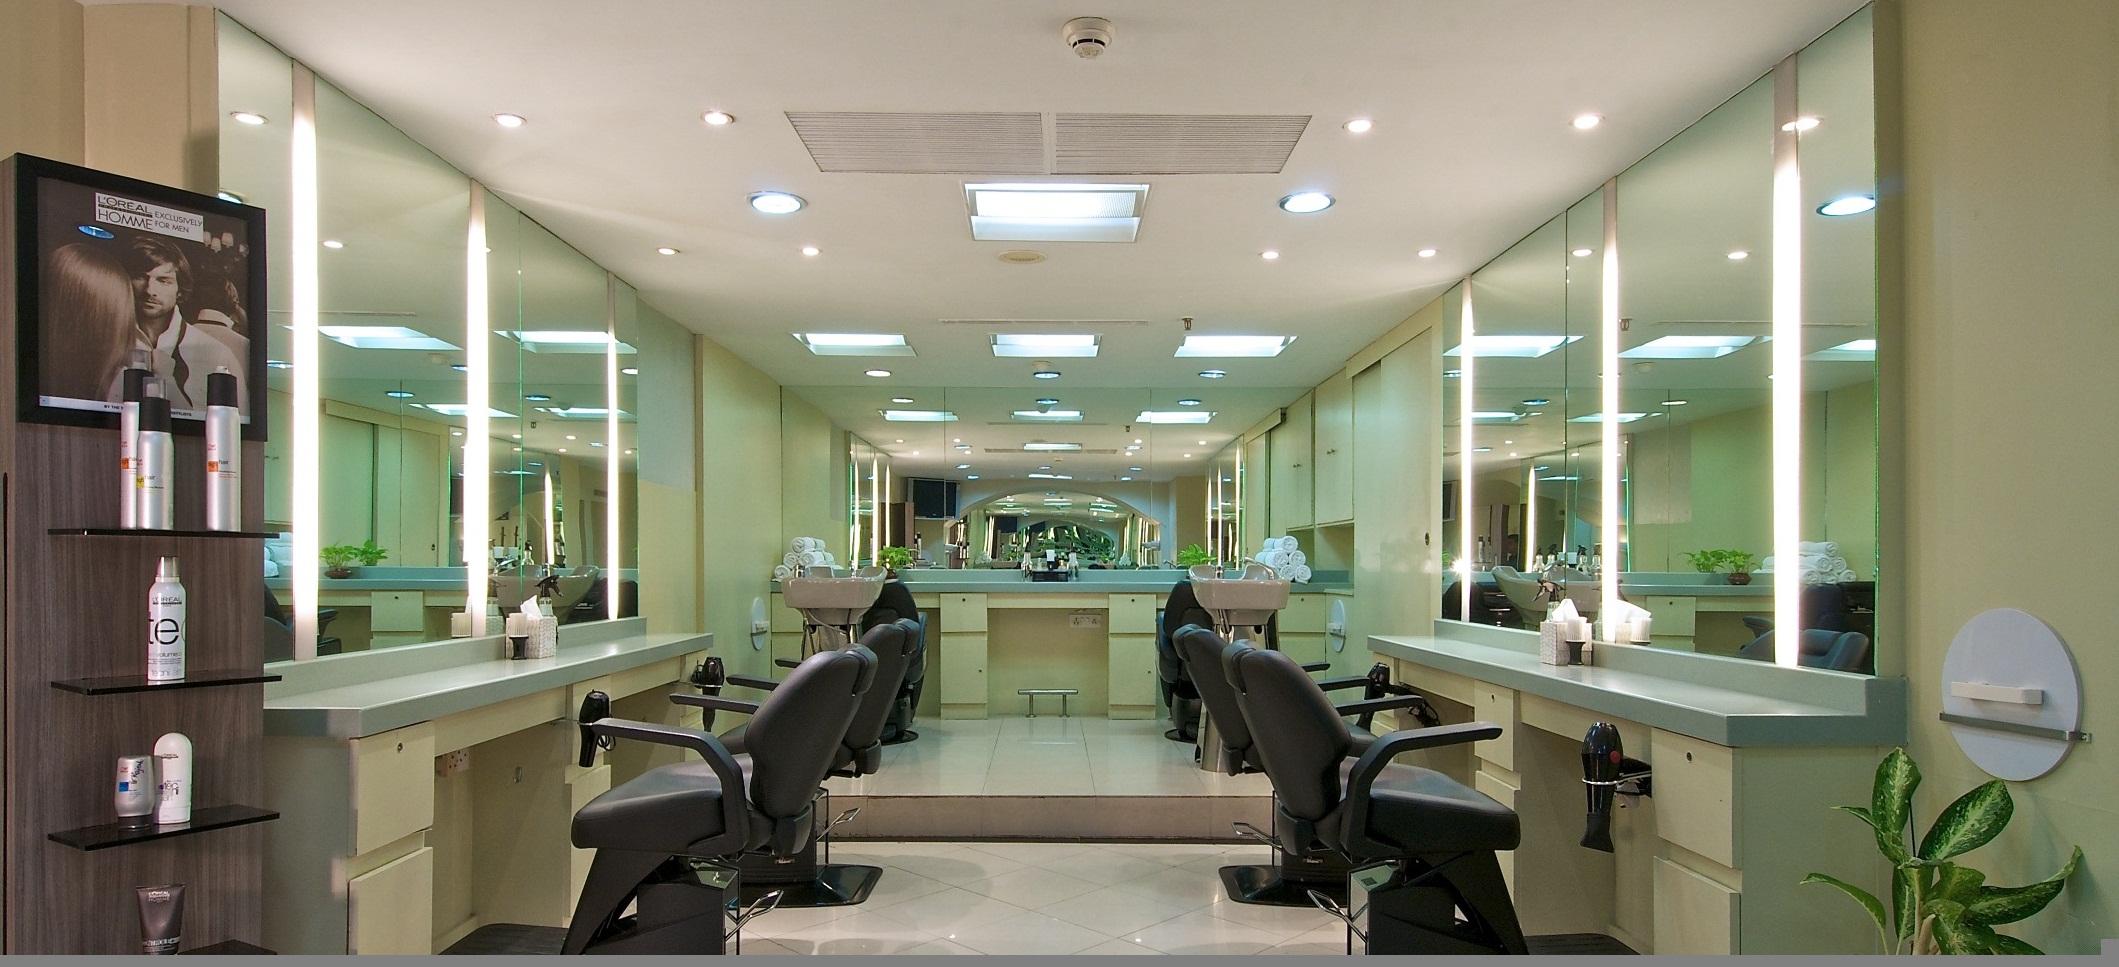 Moroccanoil hydrating treatment at taj palace salon new for Salons in mumbai